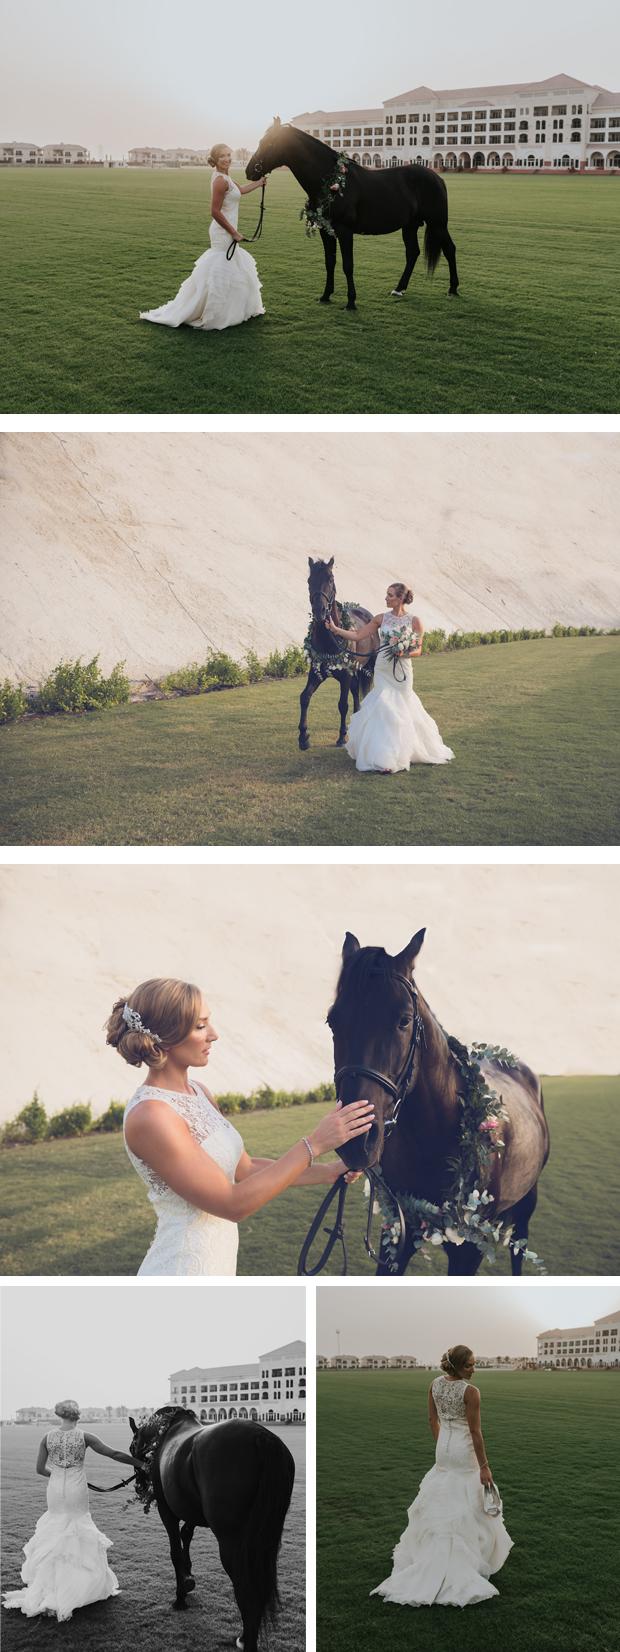 Wedding Horse Dubai Bridal